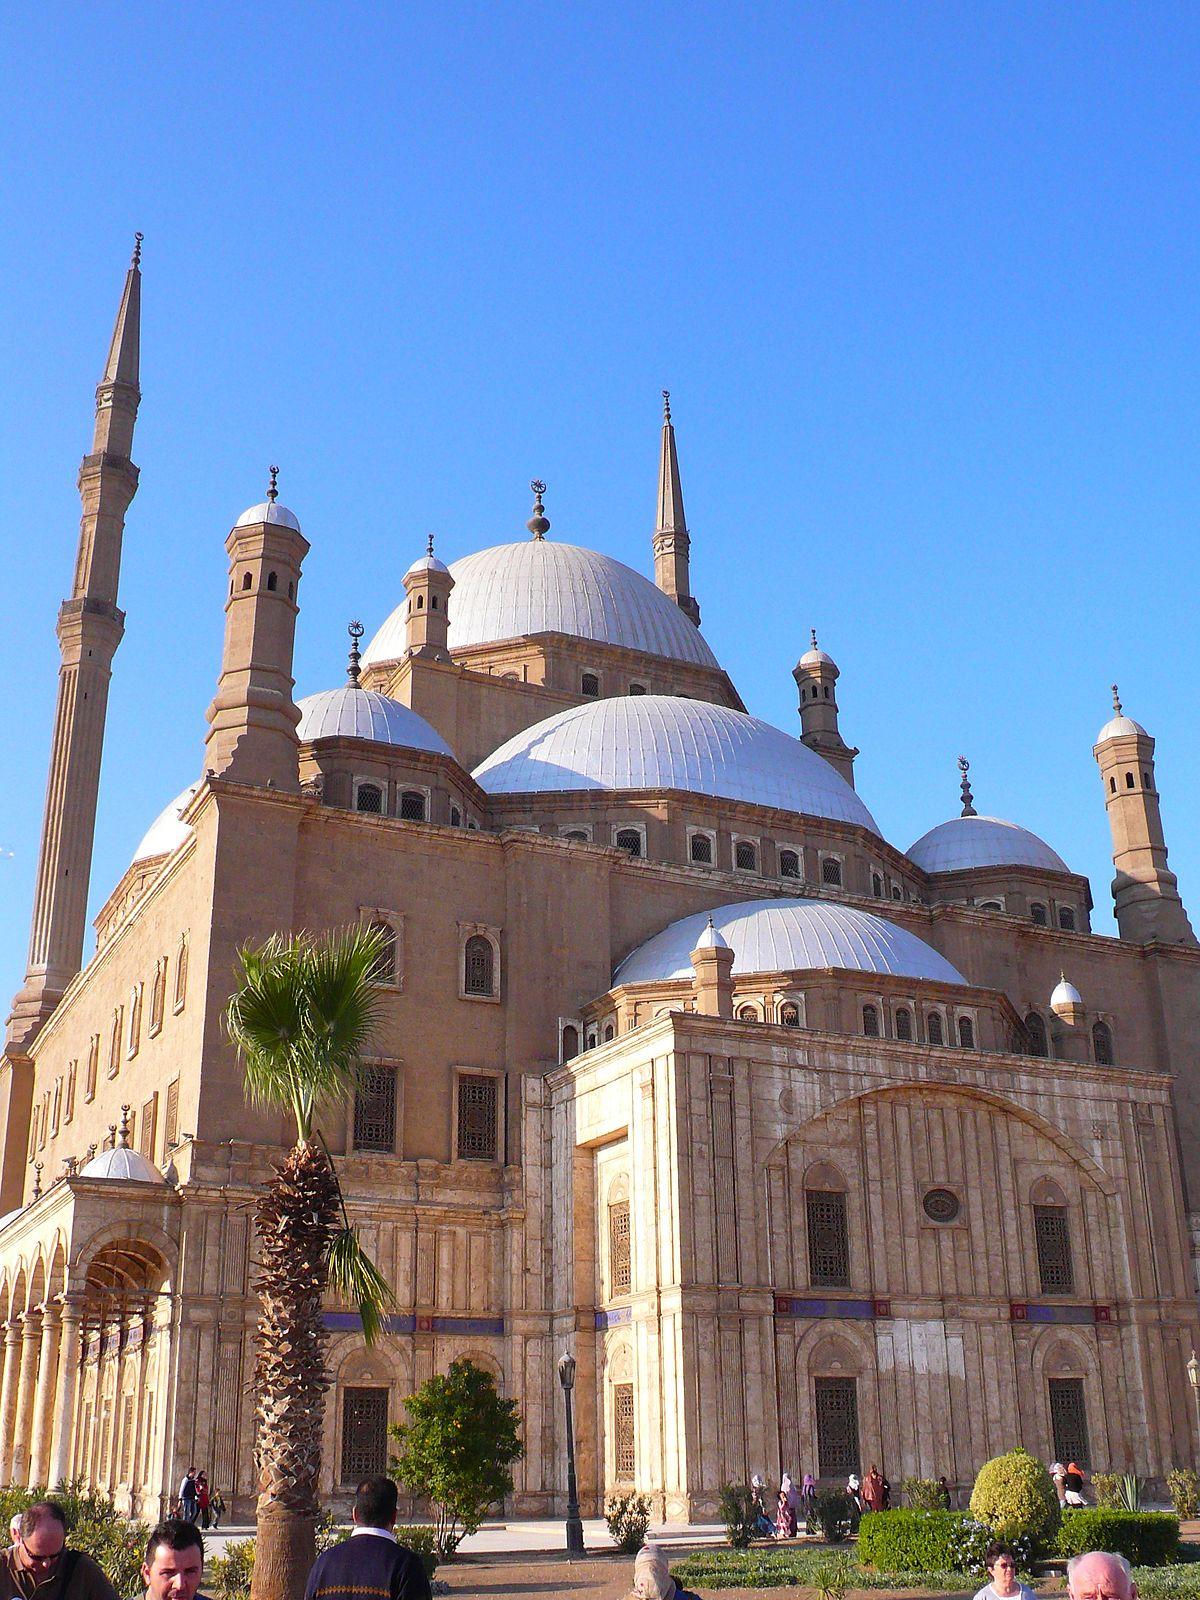 Ottoman architecture - Simple English Wikipedia, the free ...